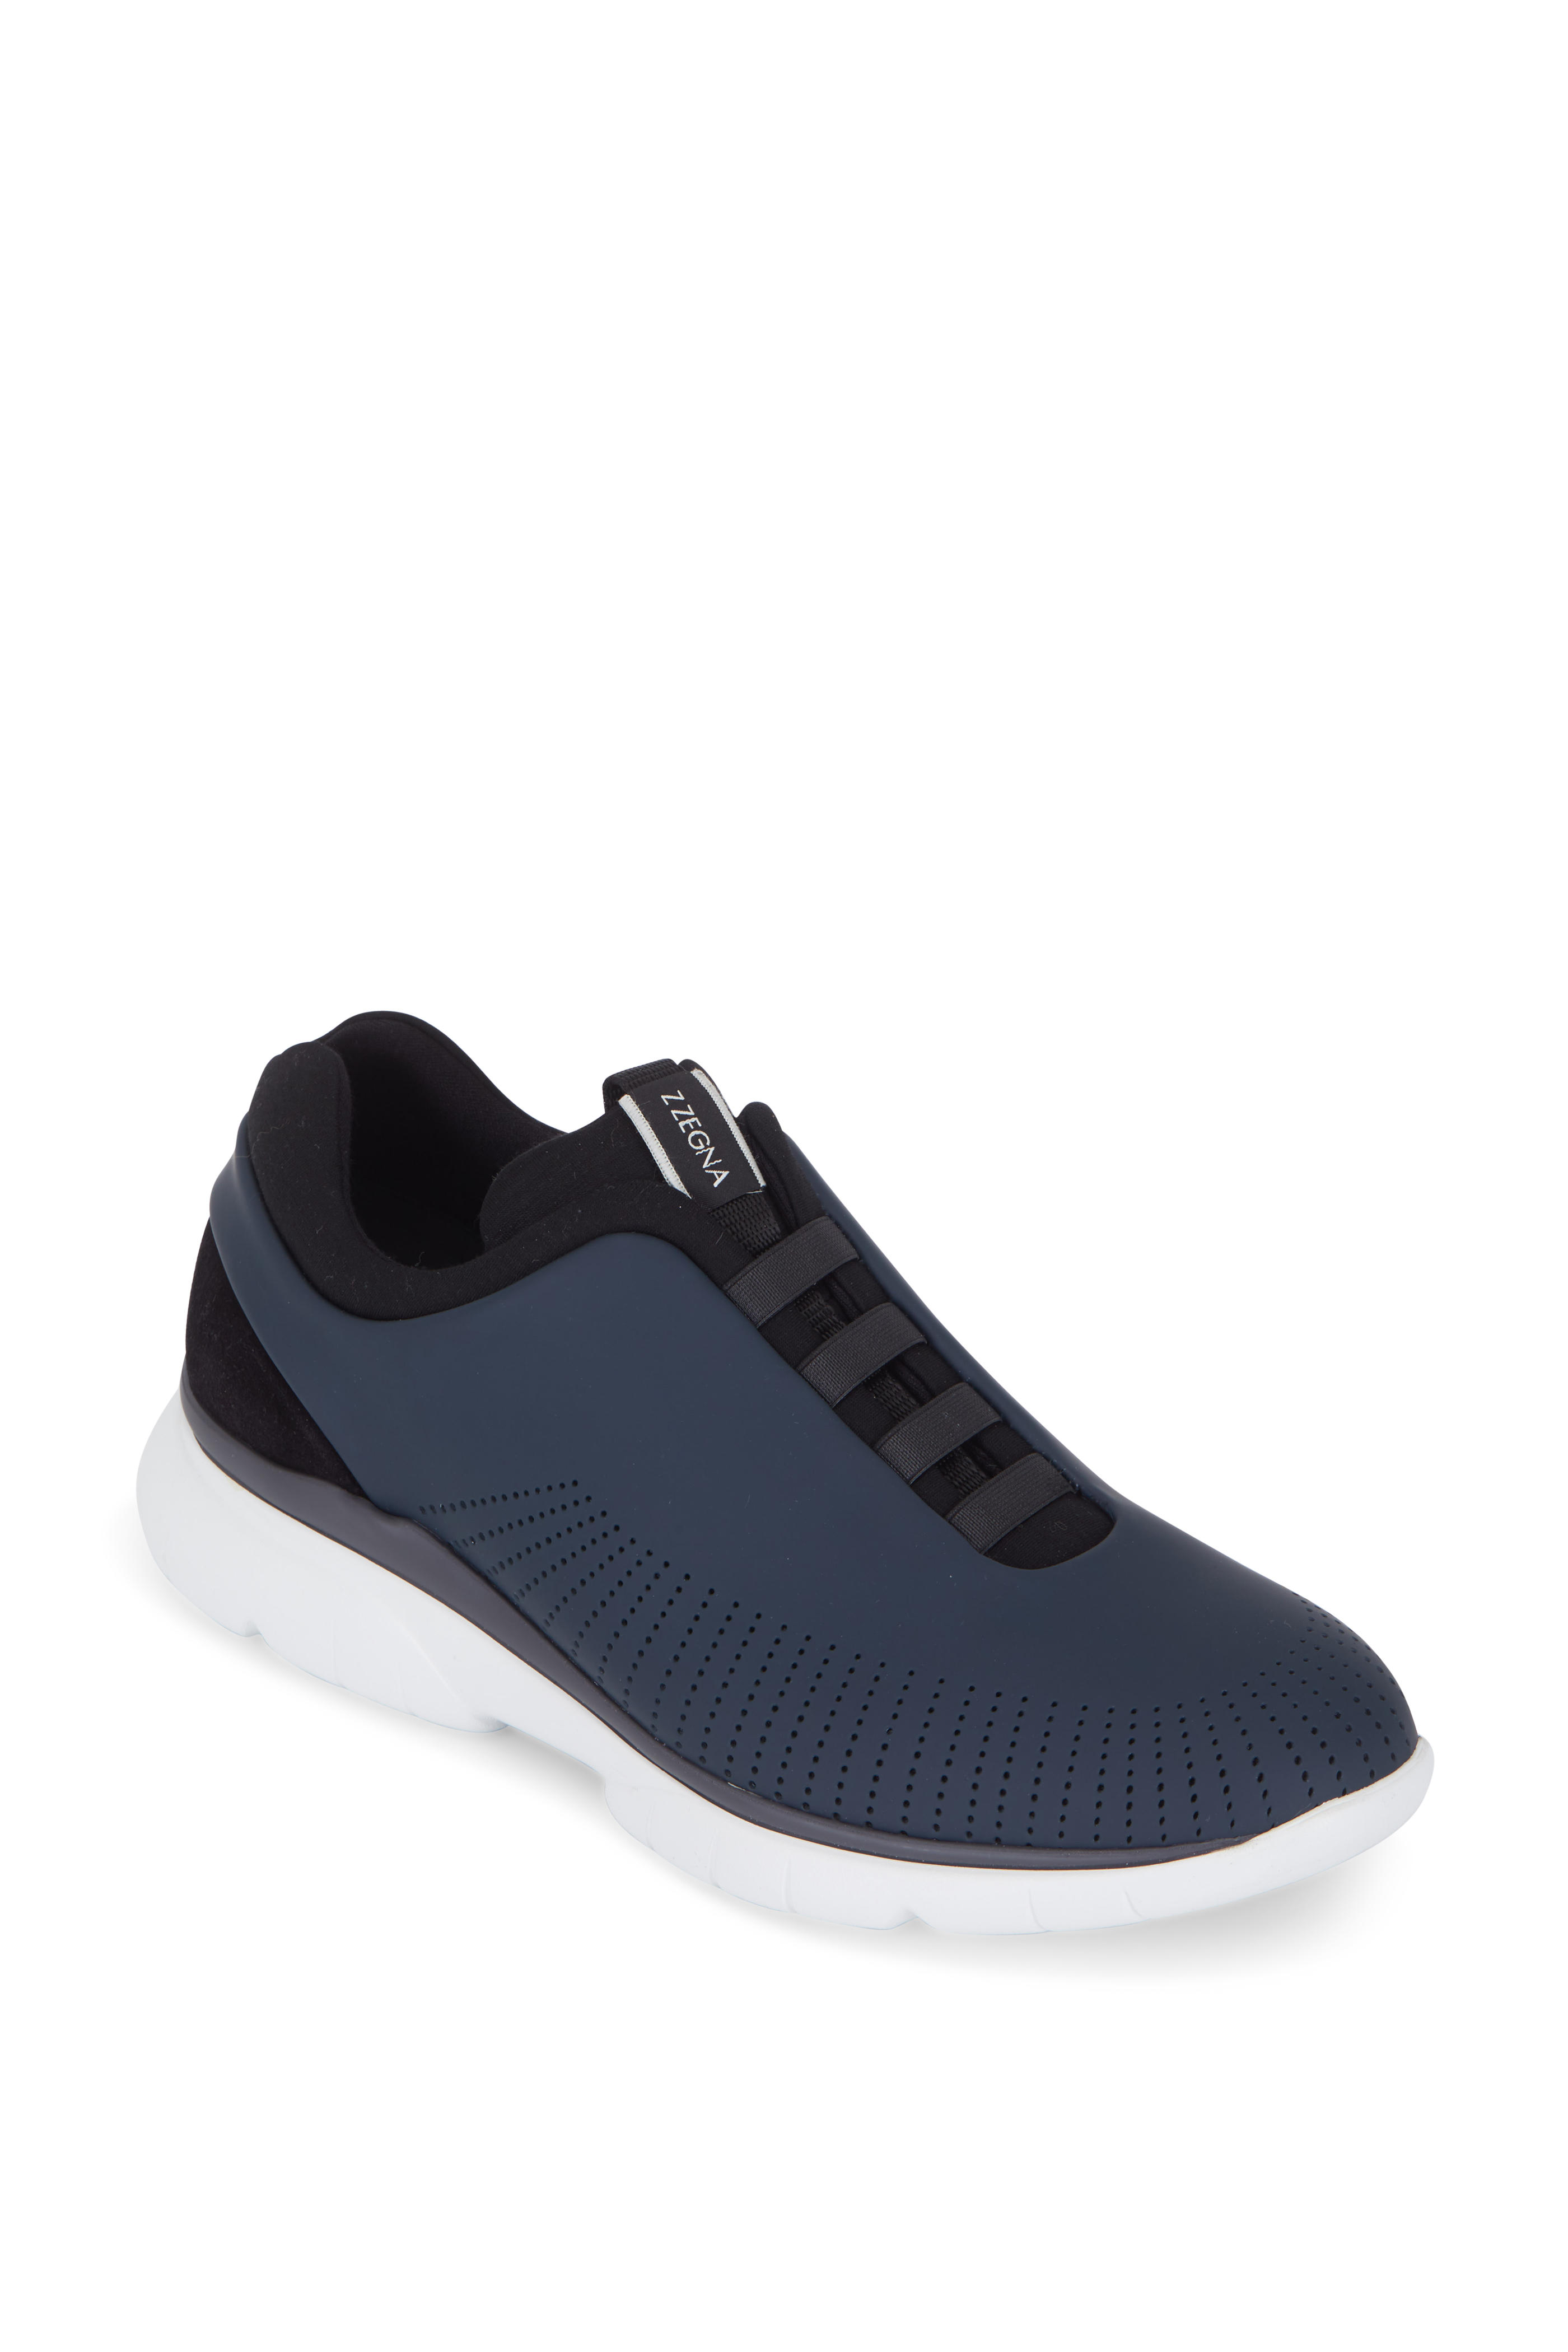 33afc92c Ermenegildo Zegna - Sprinter 2.0 Navy Blue Tech Leather Sneaker ...